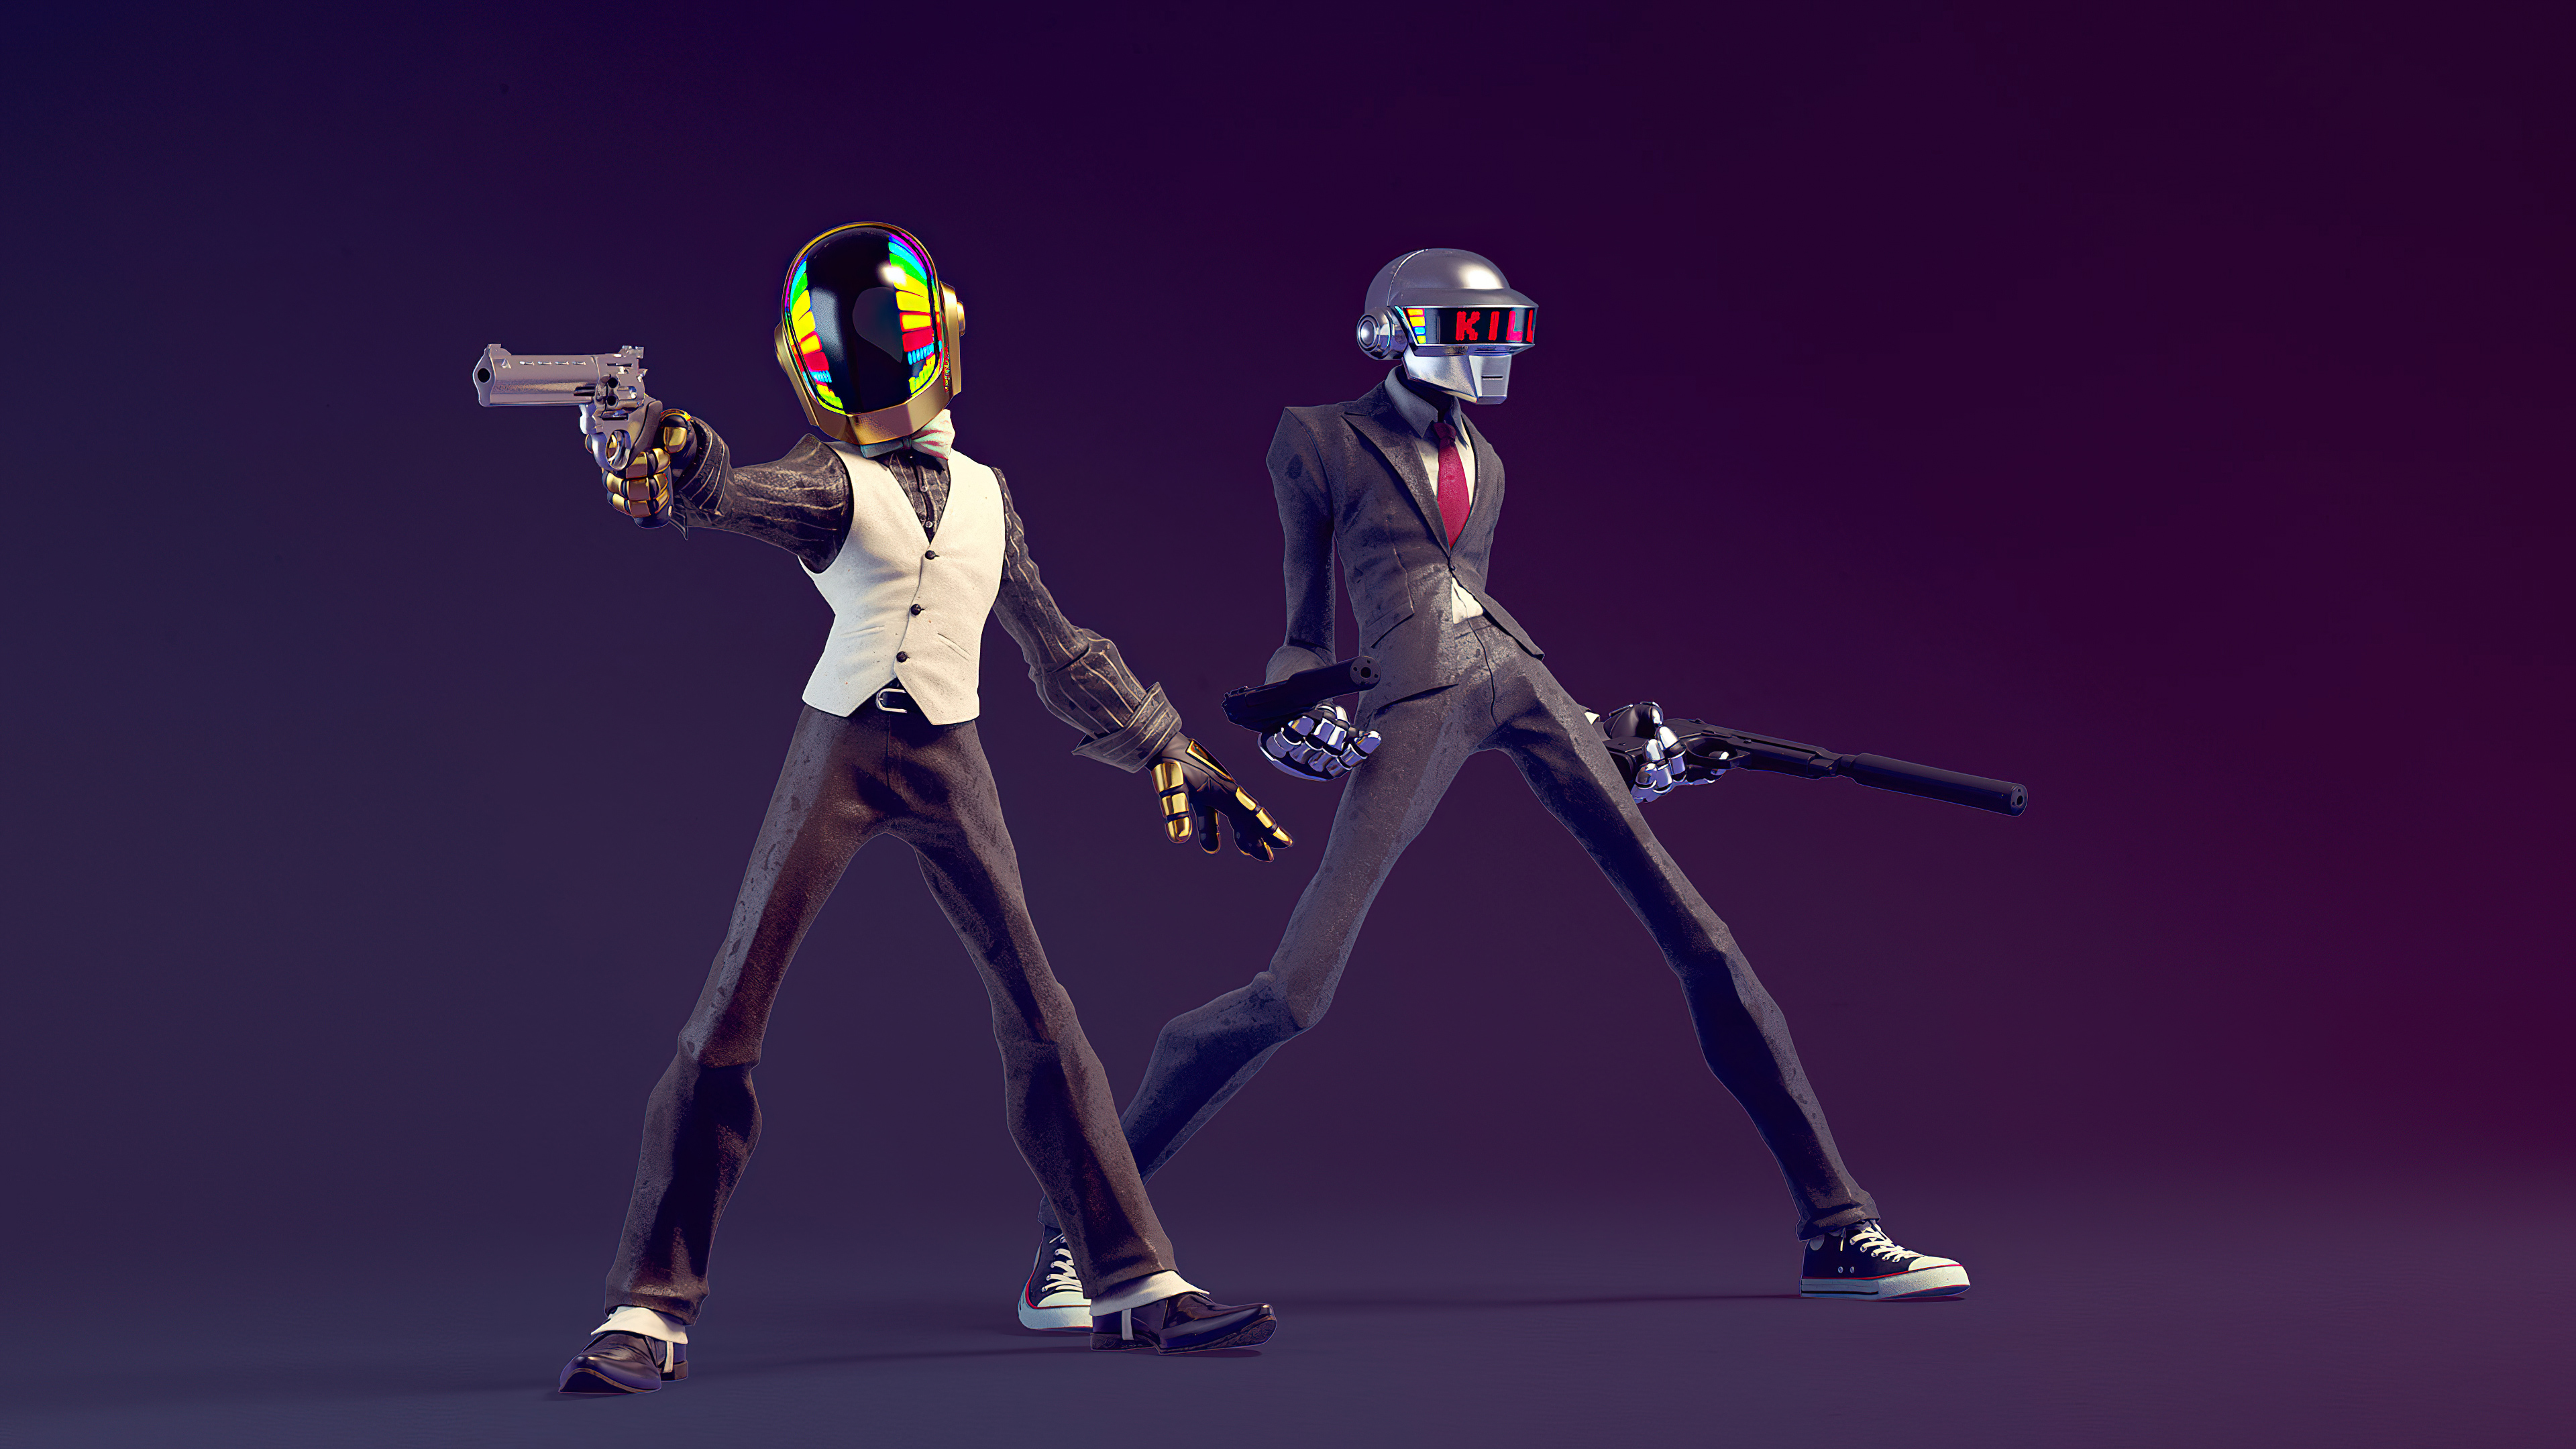 Daft Punk Do You Feel Lucky 4k, HD Music, 4k Wallpapers ...